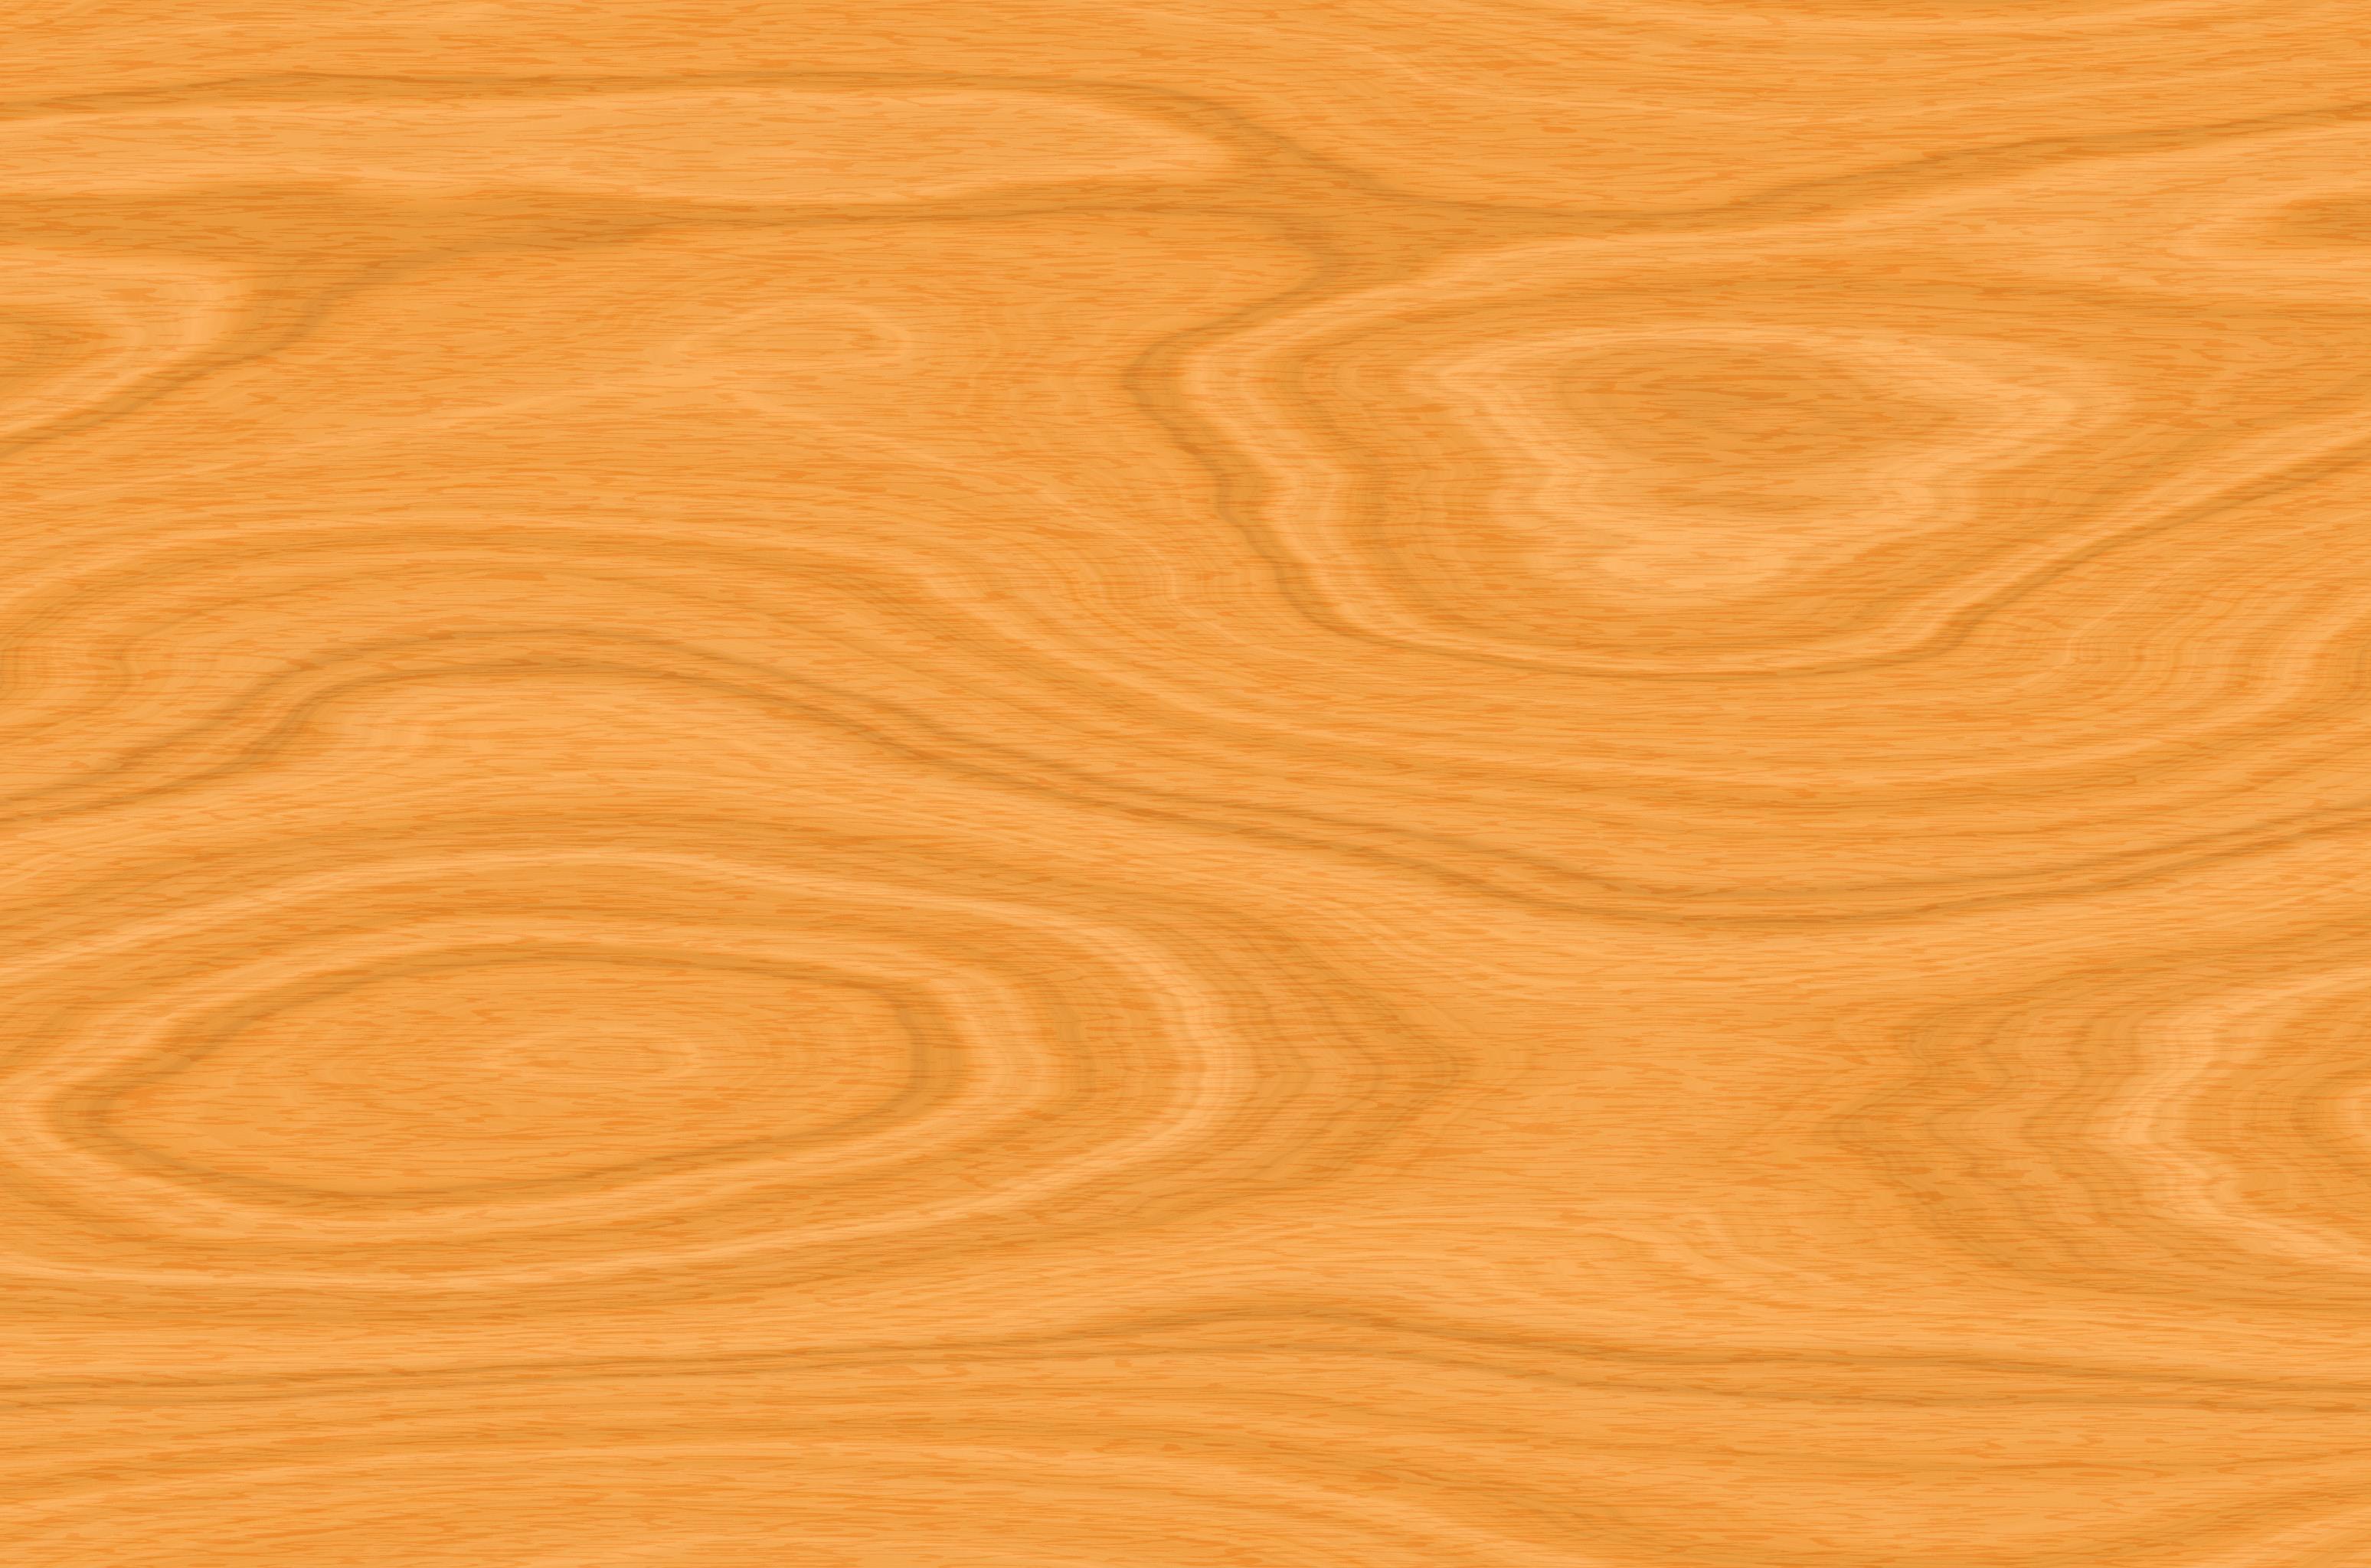 holz stock modell hartholz hlzern naturale bodenbelag sperrholz holzboden laminatboden holzbeize - Hartholz Oder Laminatboden